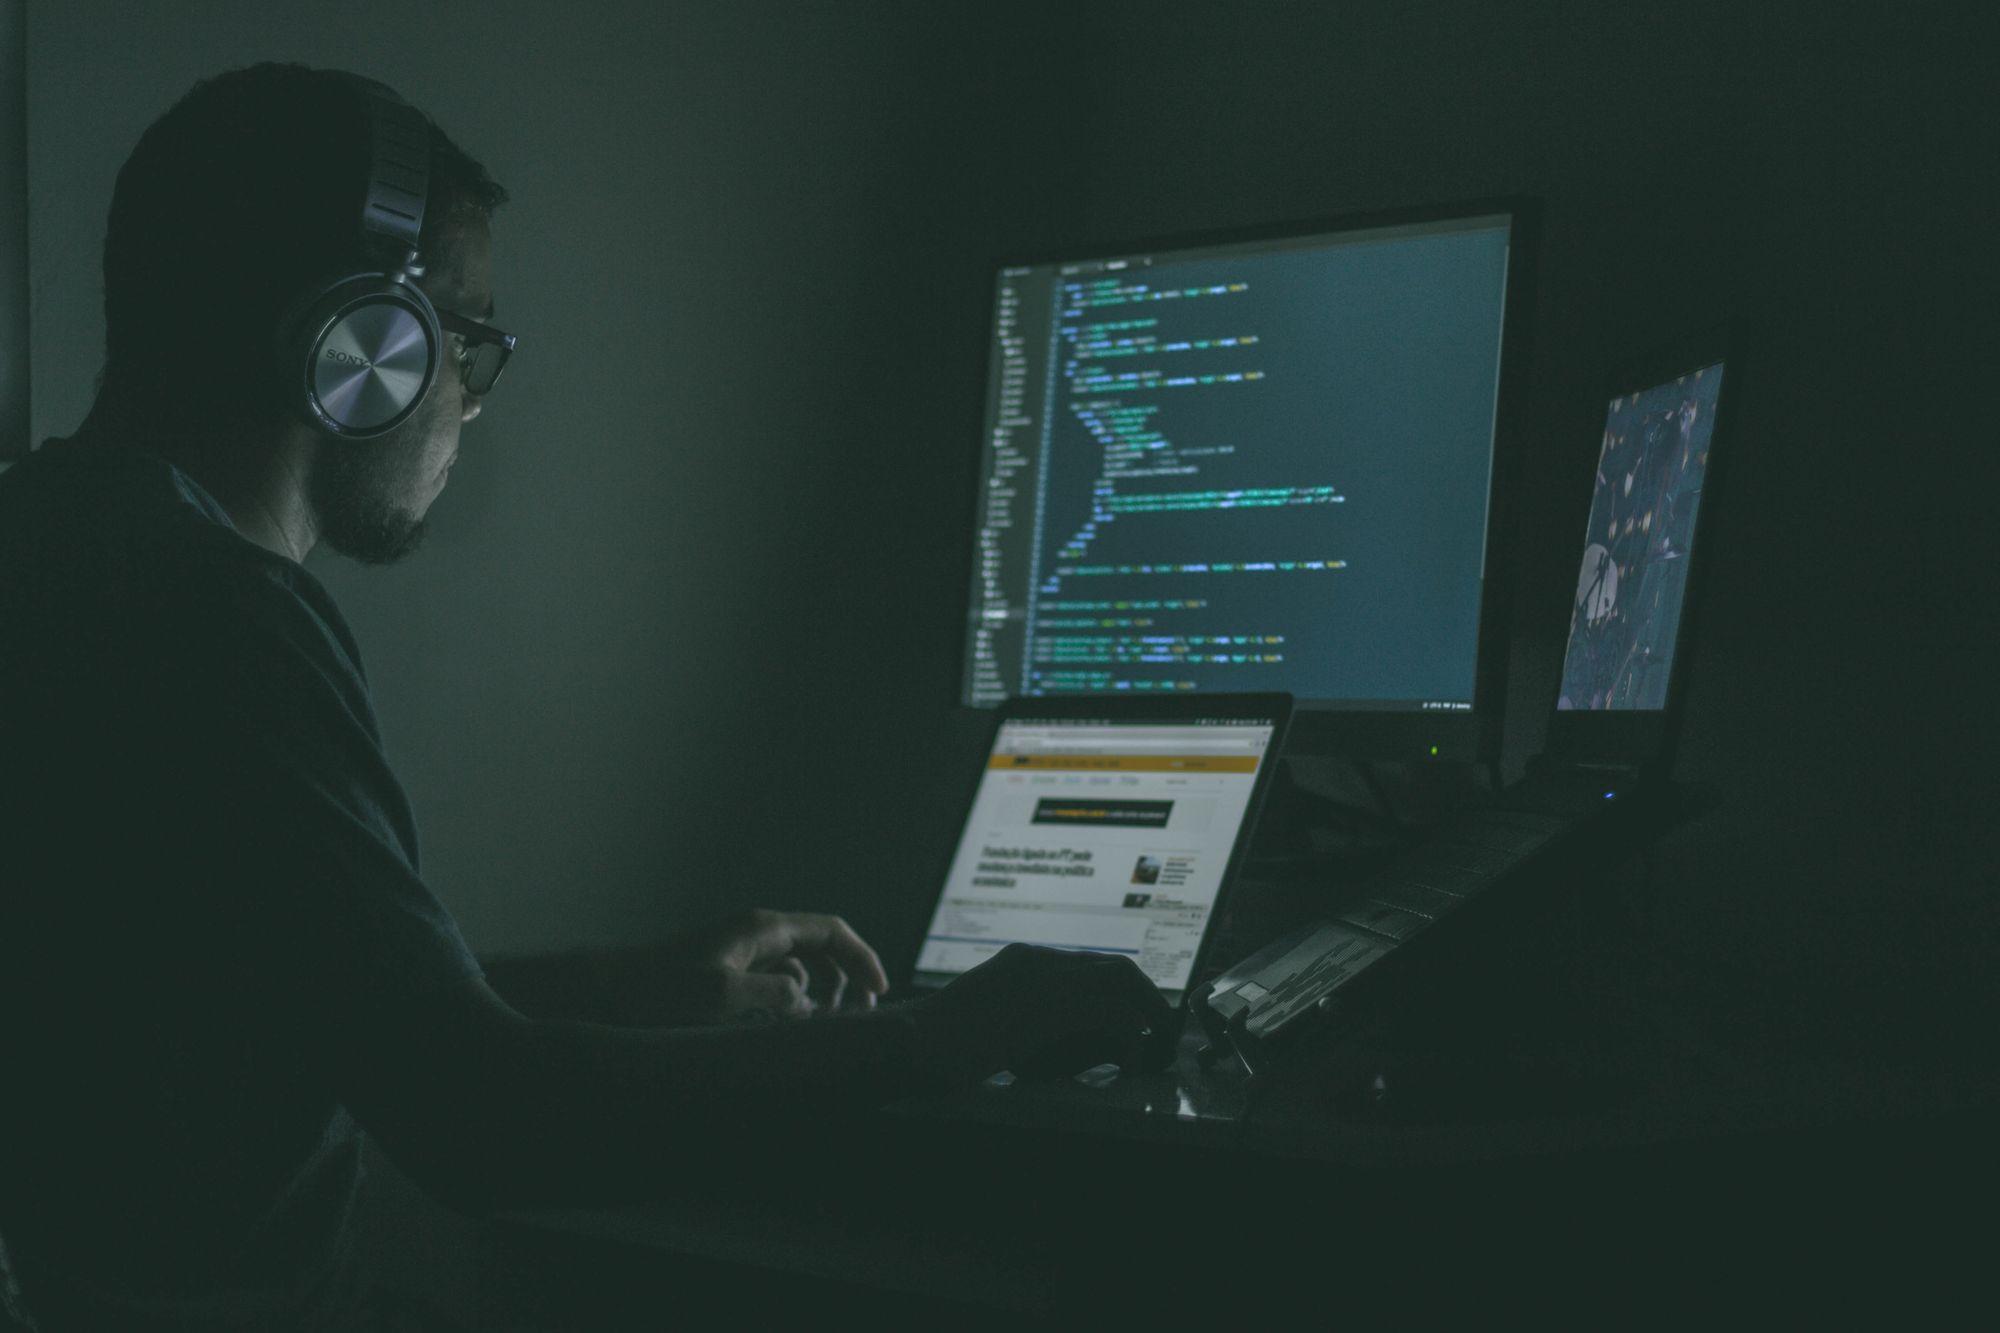 Programmer vs Developer vs Engineer: An Ultimate Guide for Technical Recruiters To Tell Them Apart image